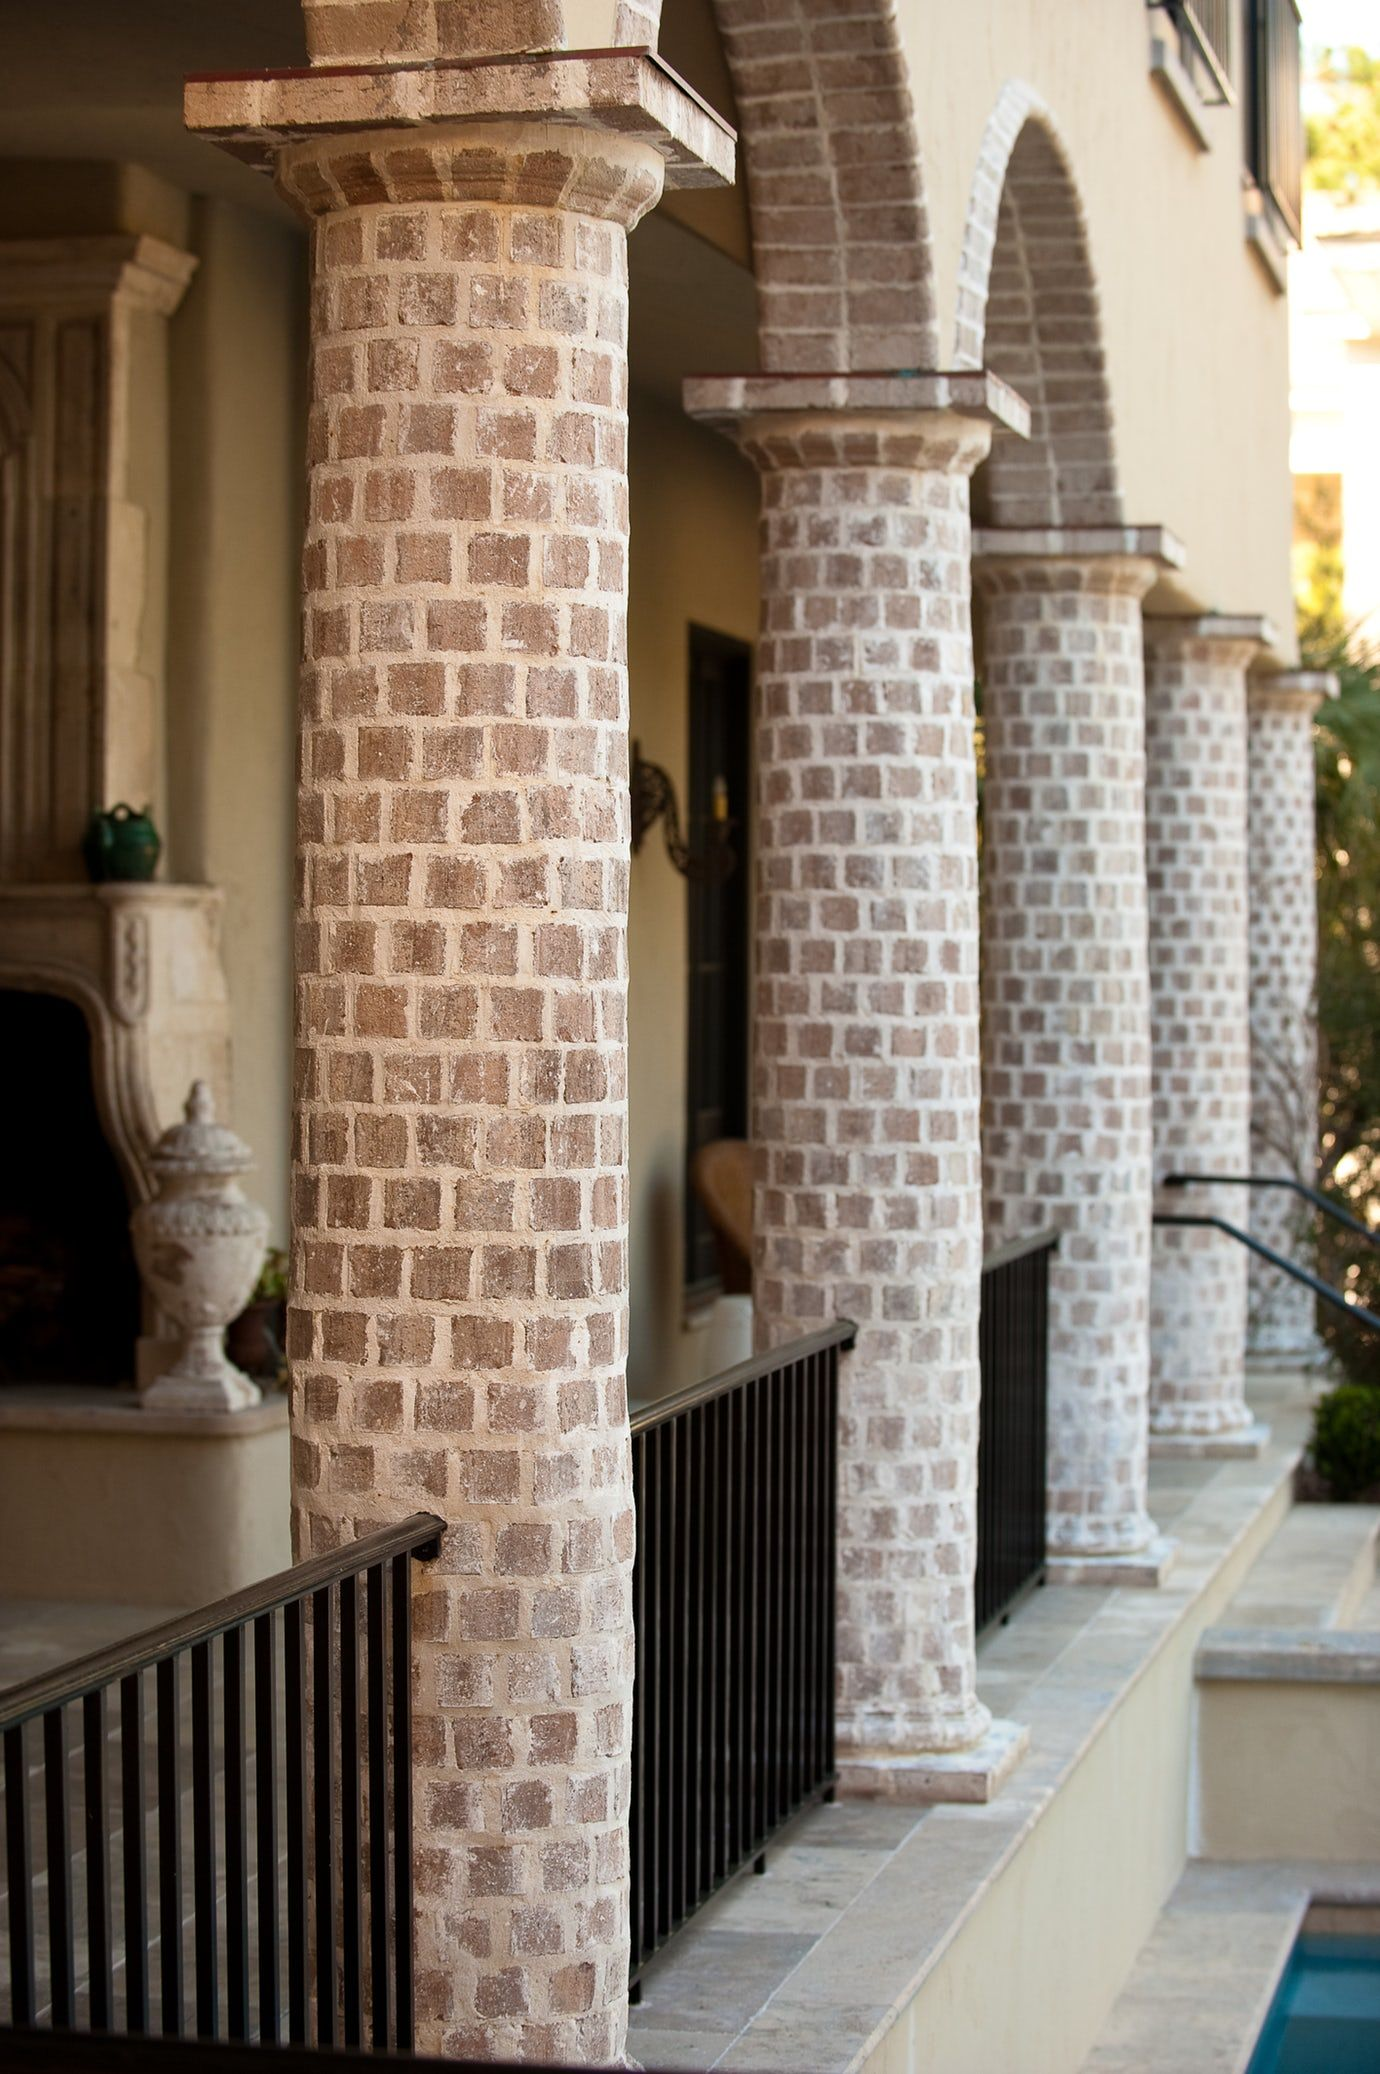 Round Brick Column Loggia With Brick Arches And Black